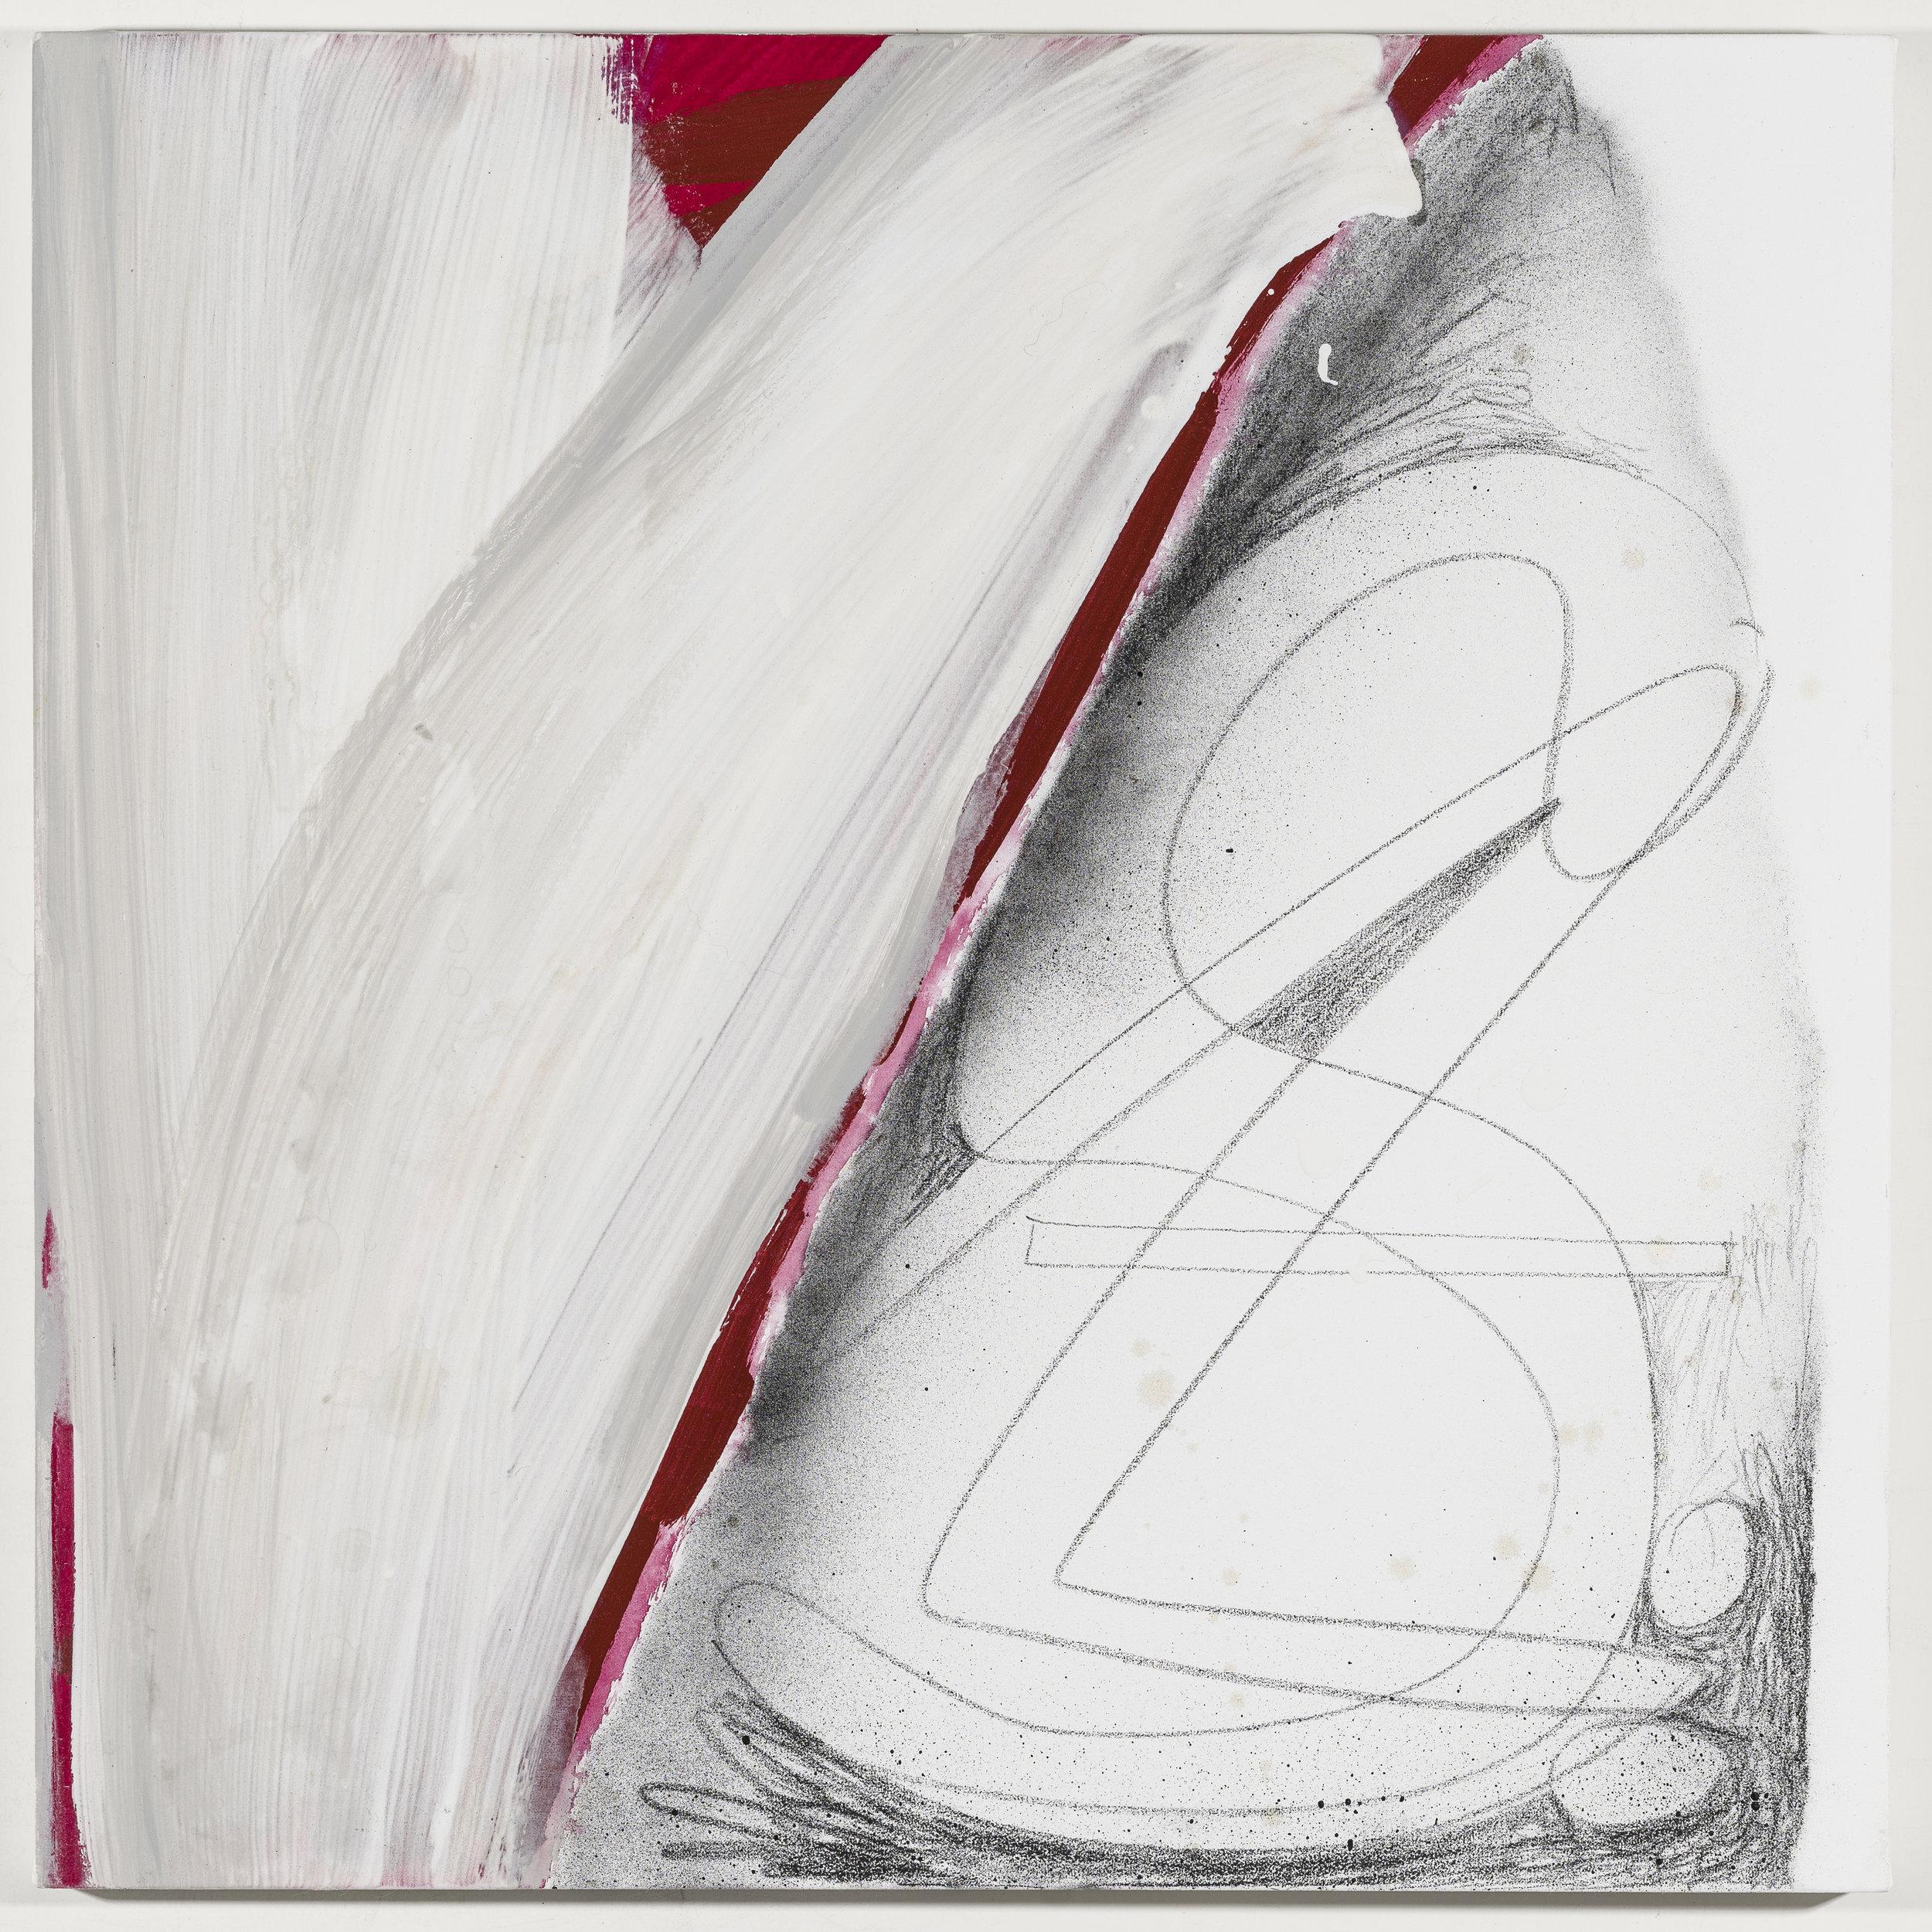 Initials: Sasheer Zamata   2018  Graphite and acrylic on canvas  20 x 20 inches; 51 x 51 cm